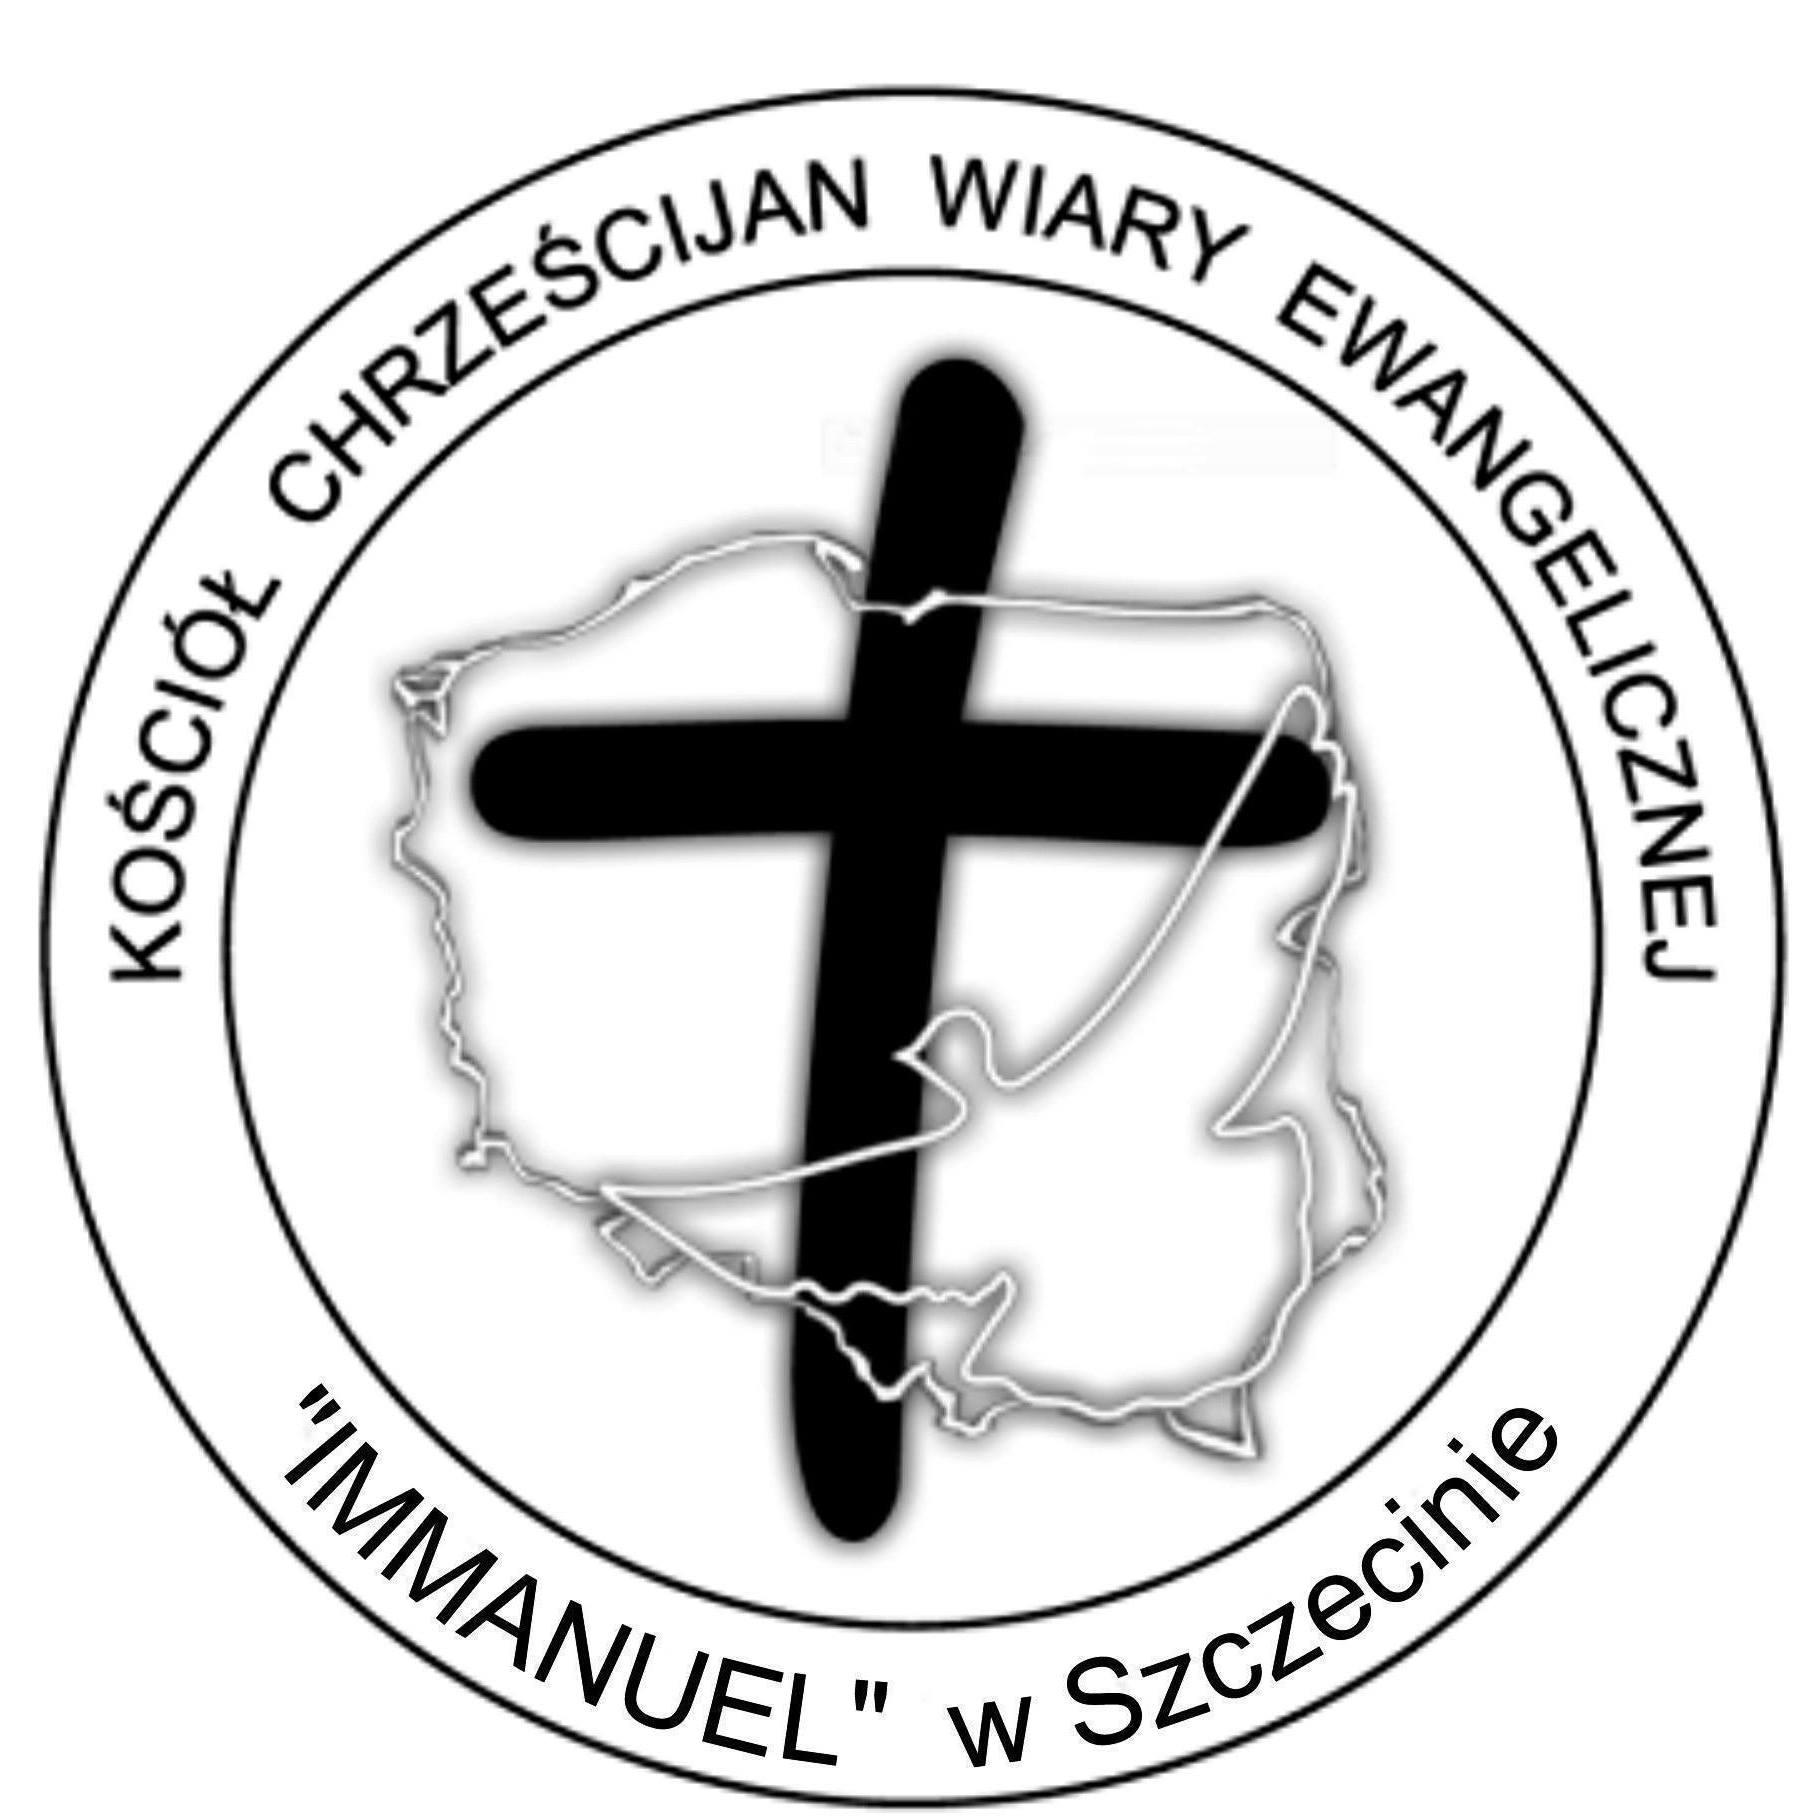 KChWE Immanuel